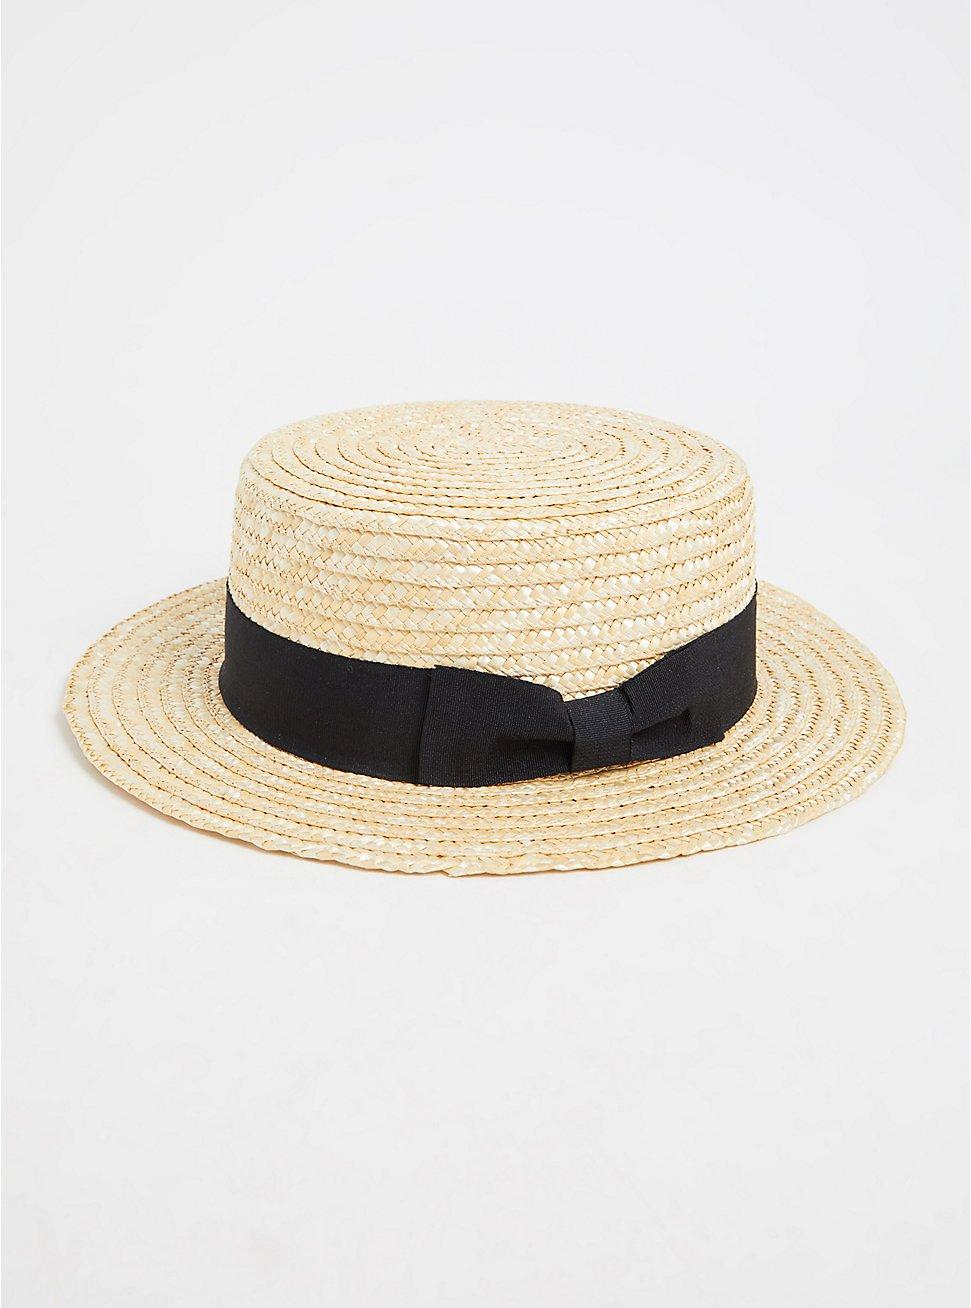 Ivory Straw Contrast Band Boater Hat, NATURAL, hi-res